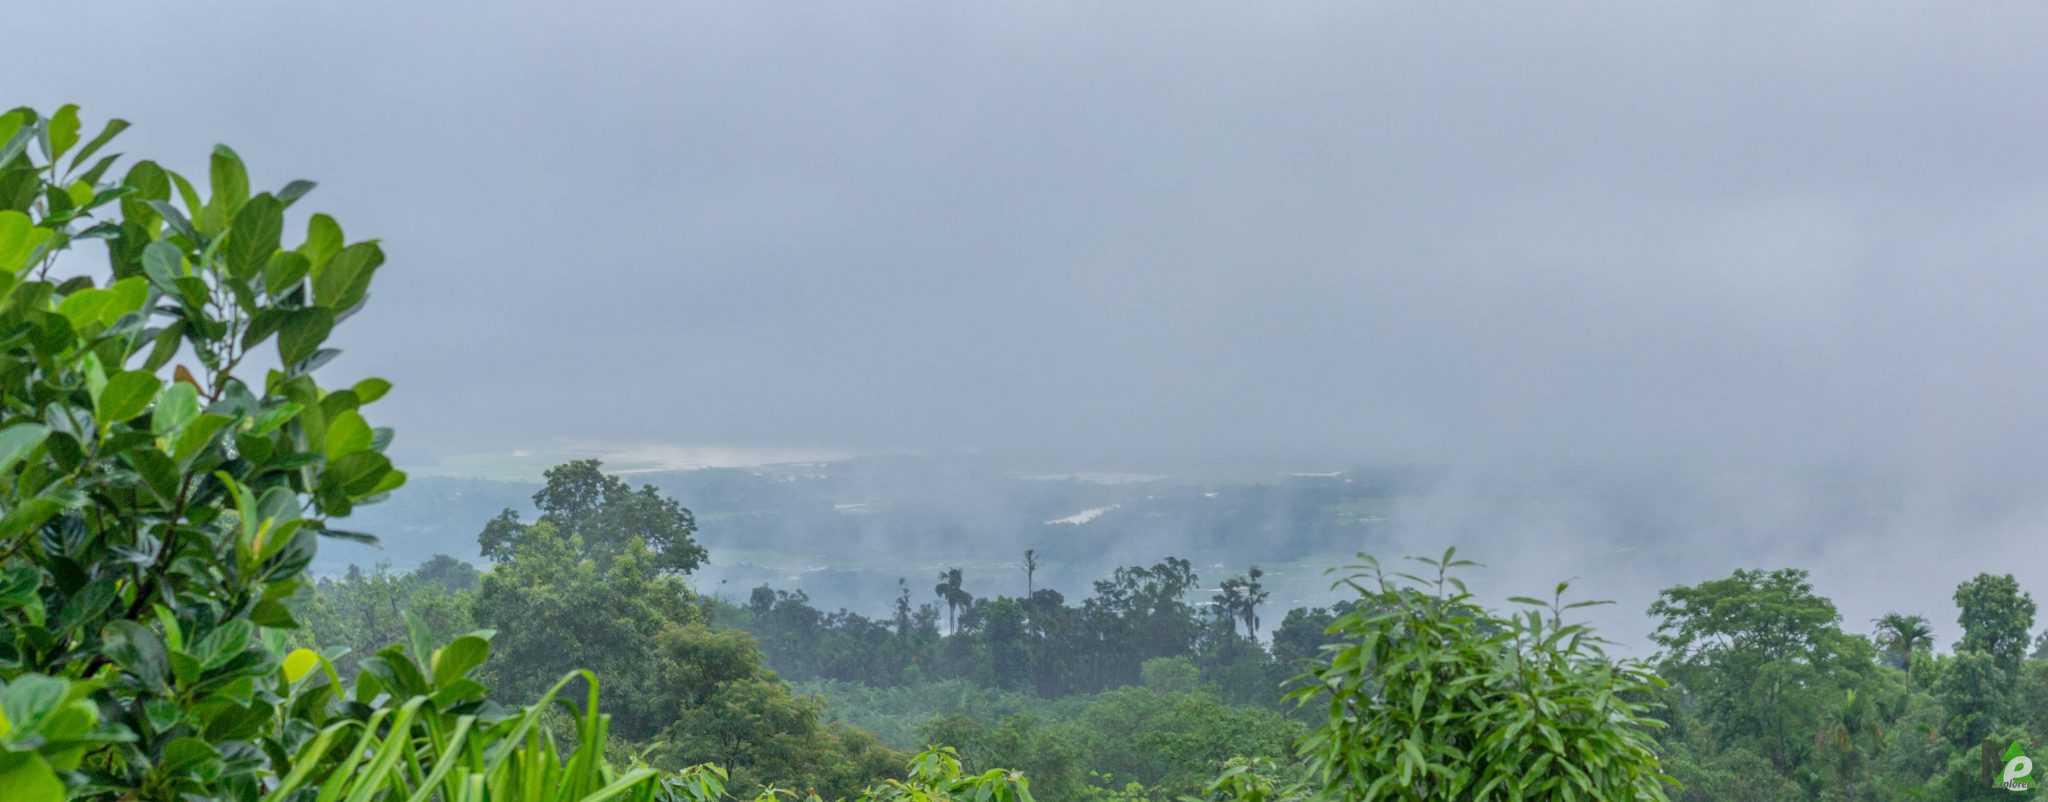 Bangladesh view From Mawlynnong